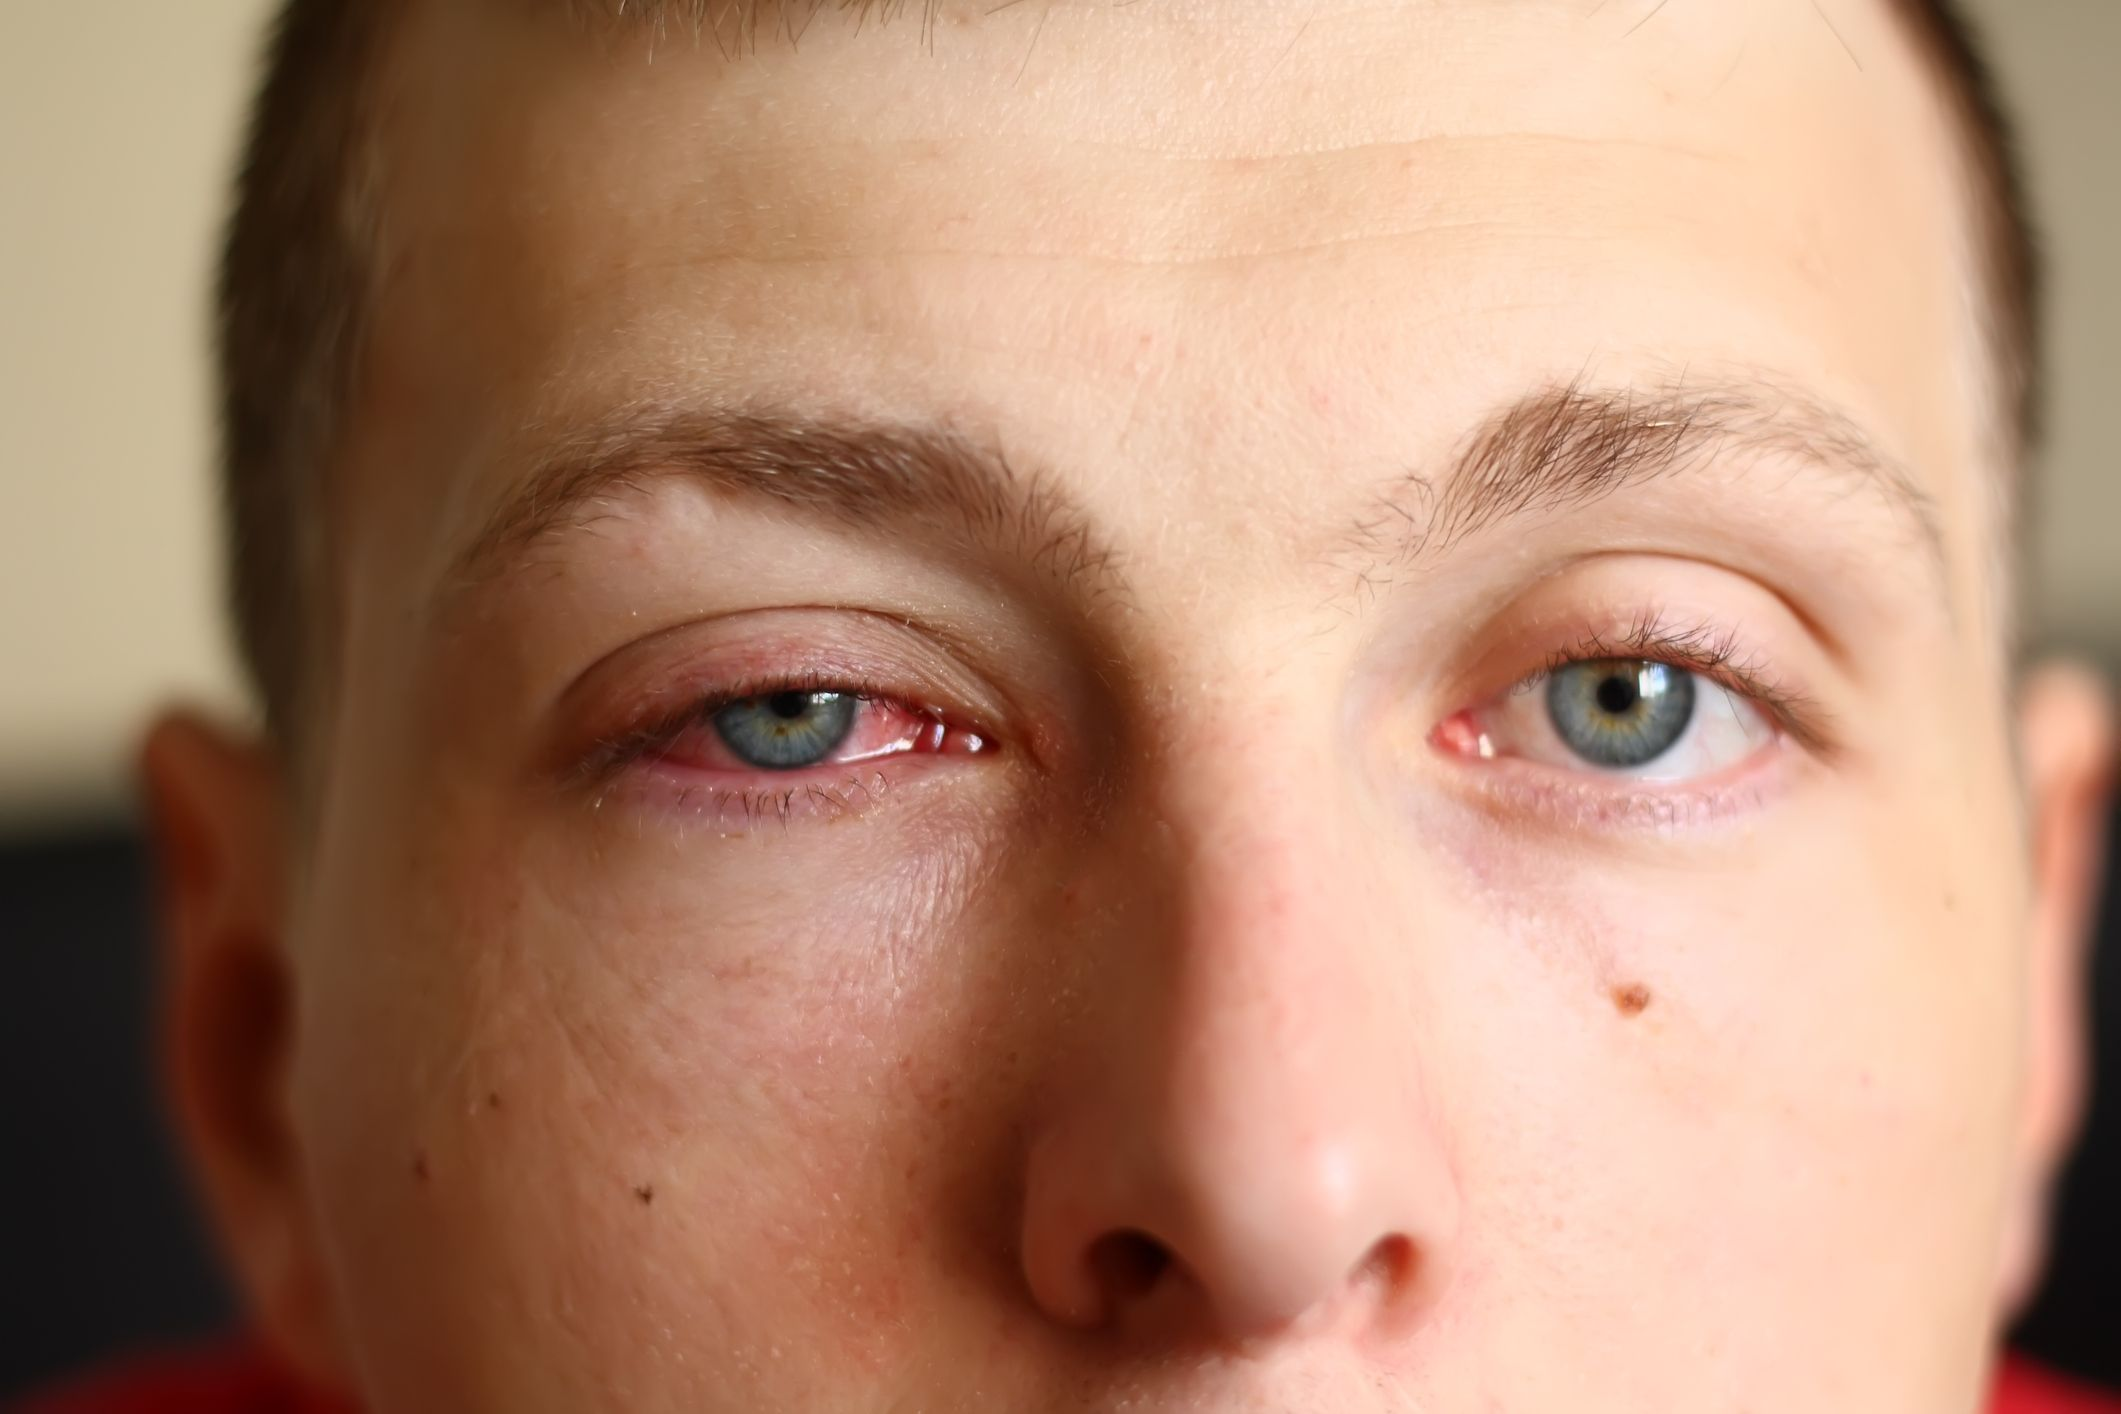 Pink Eye (Conjunctivitis) HealthLink BC